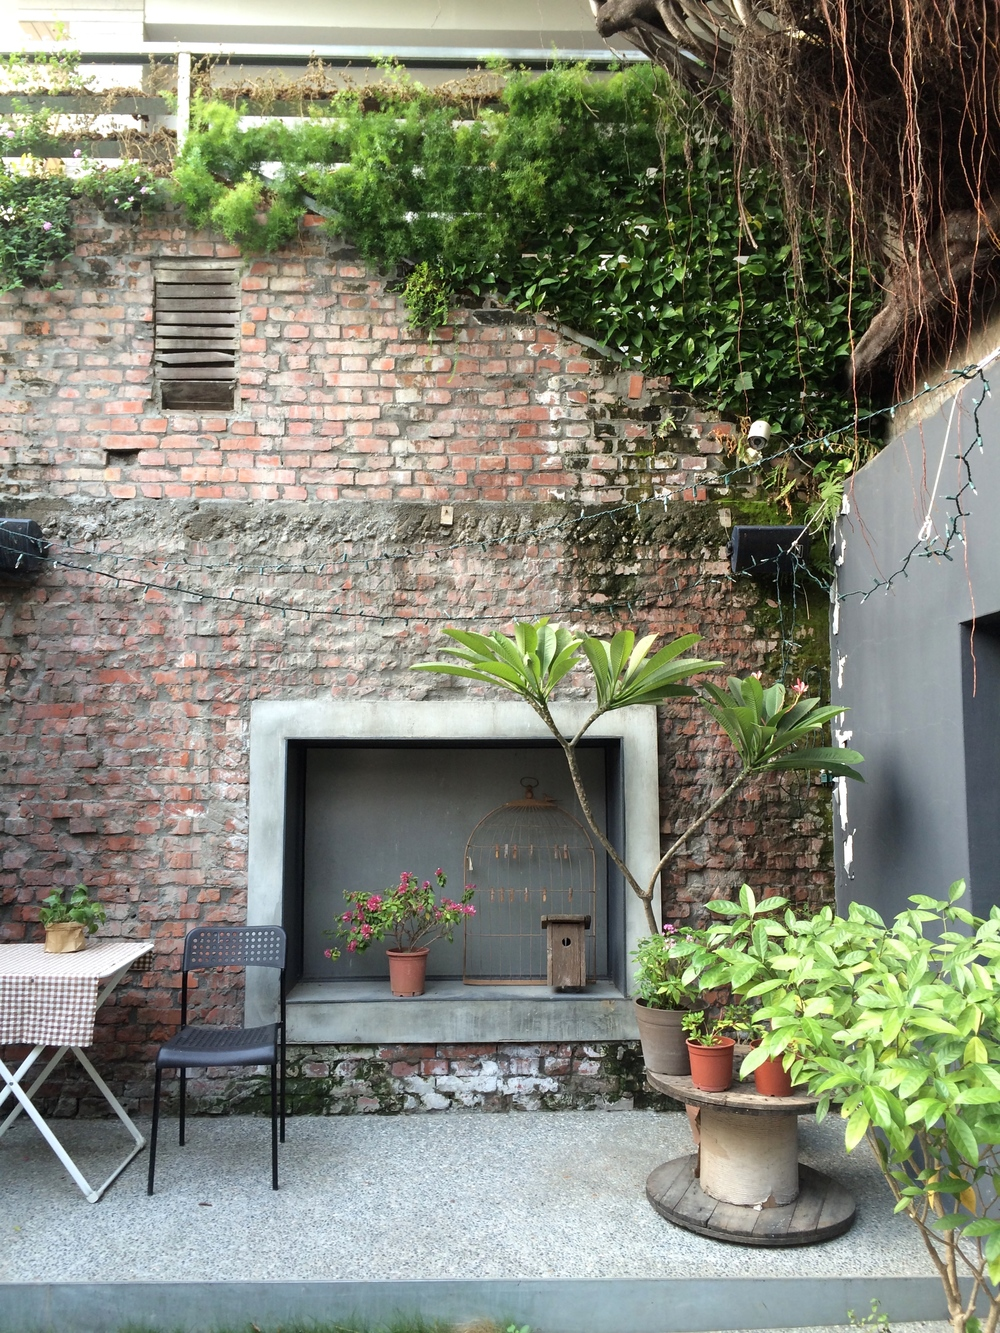 isabella's lush courtyard.